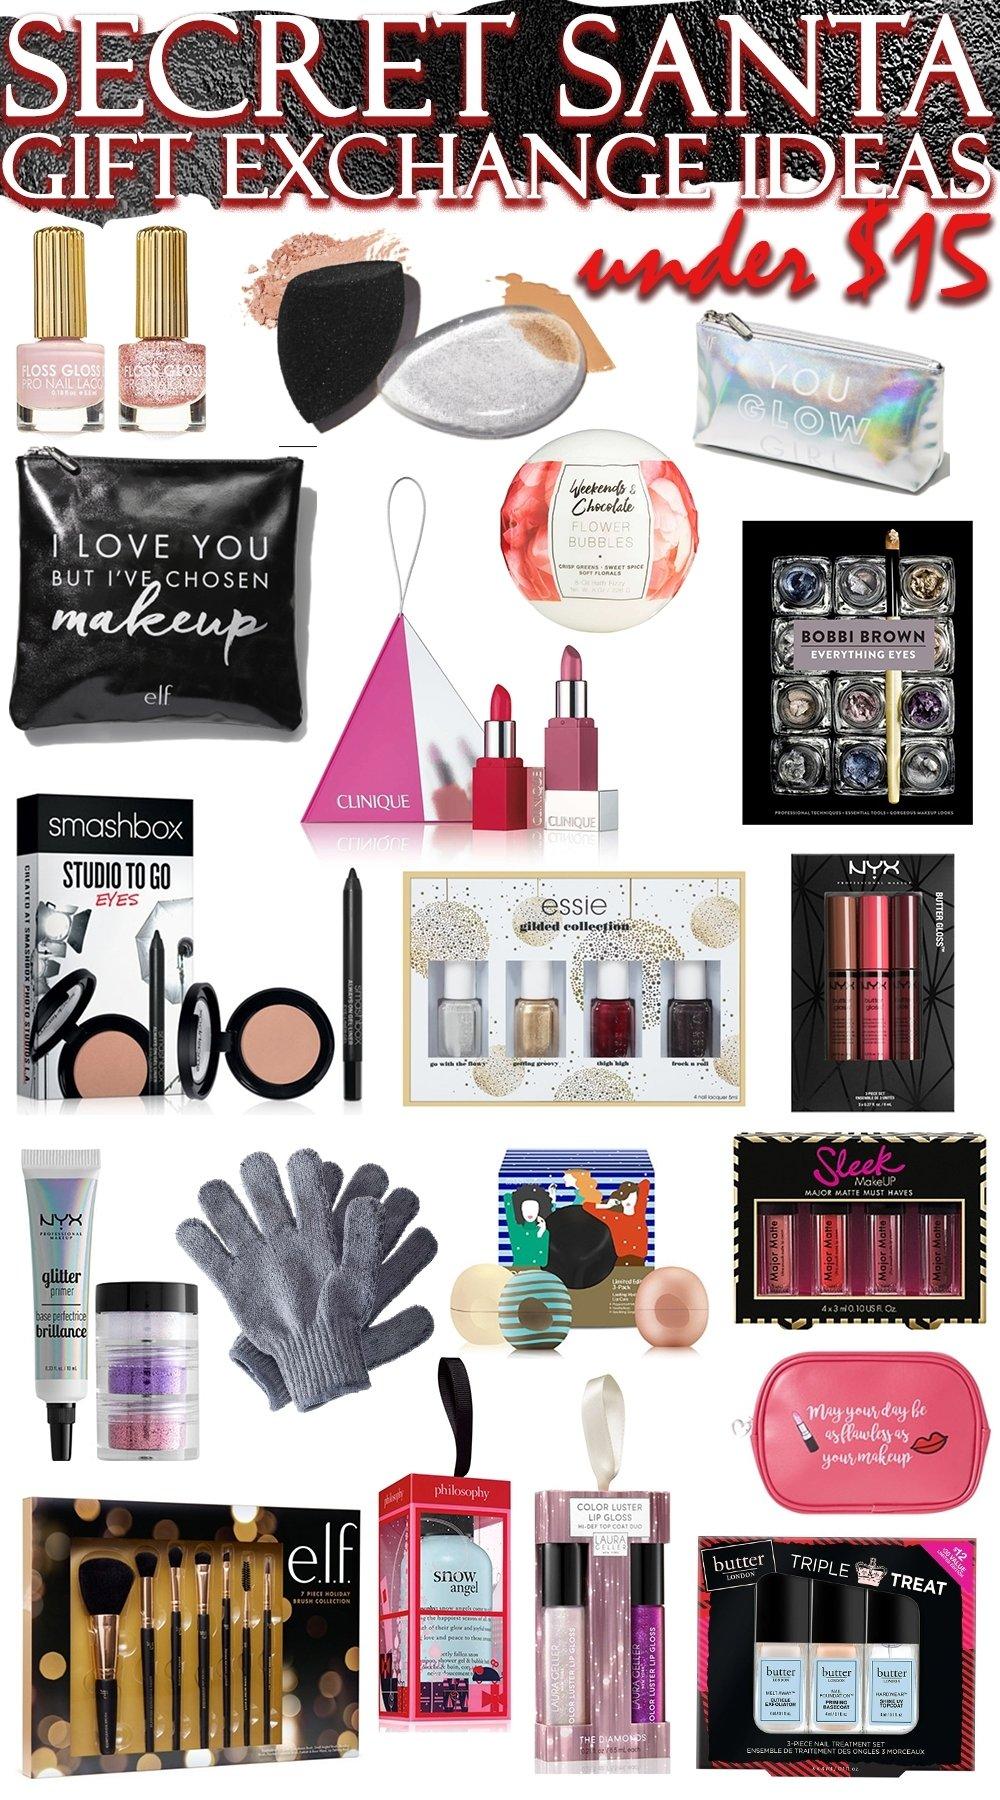 10 Trendy Ideas For Secret Santa Gifts the best secret santa gift exchange ideas in beauty all under 15 5